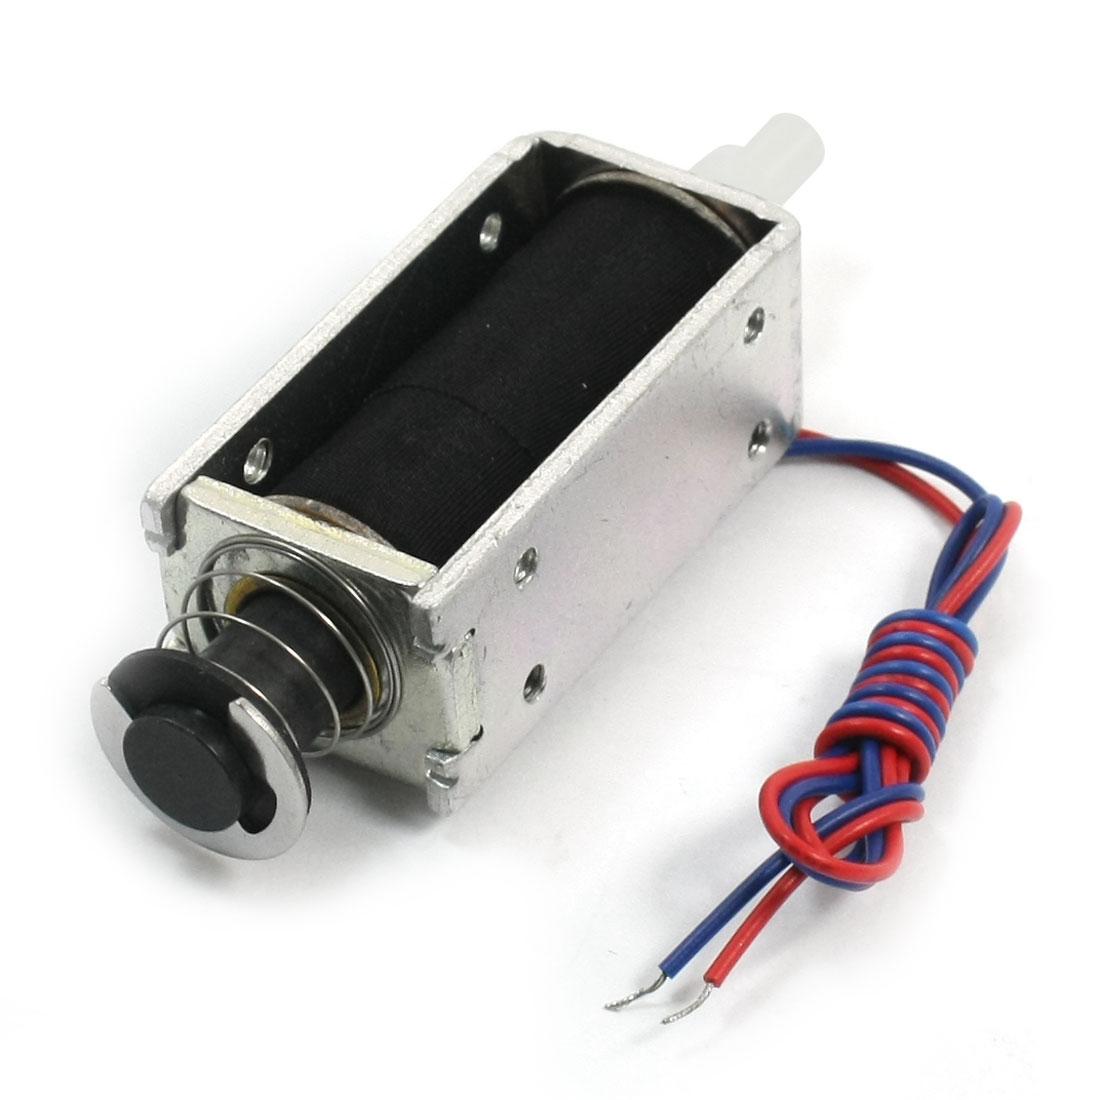 24V 0.34A 3mm 450g 5mm 400g Push Pull Type Open Frame Spring Plunger Linear Motion DC Solenoid Electromagnet